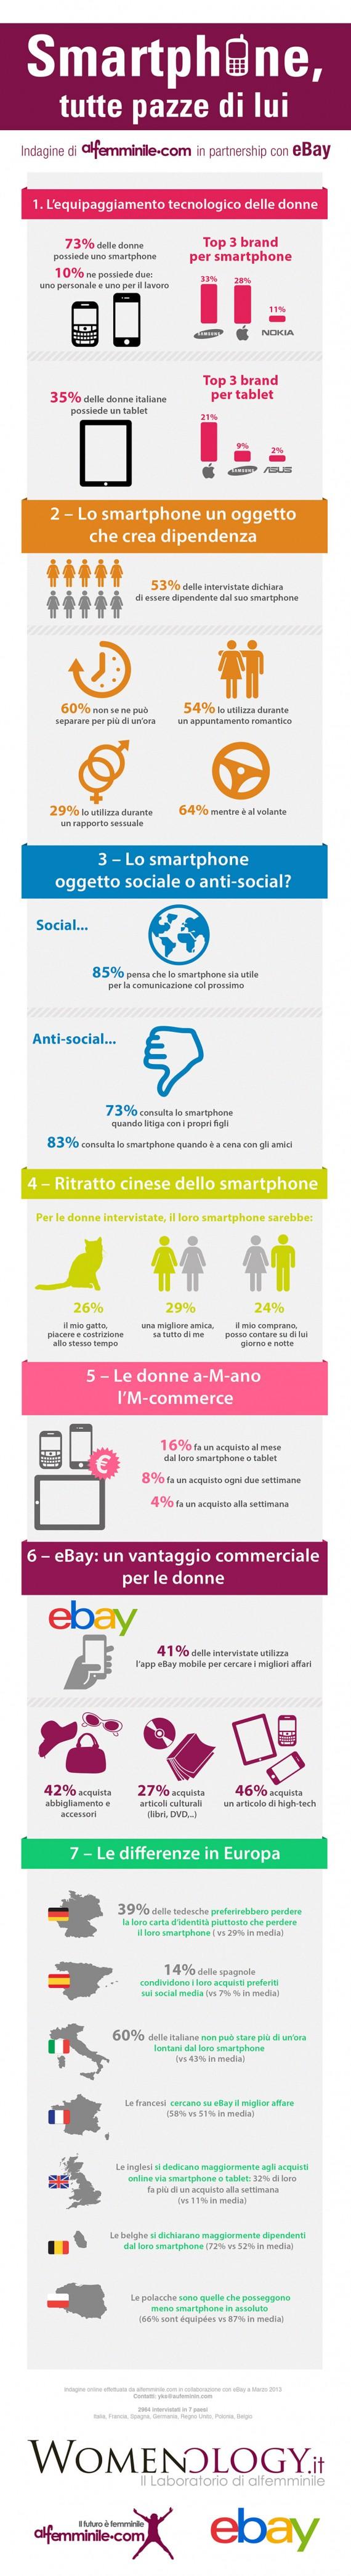 Donne-smartphone-infografica